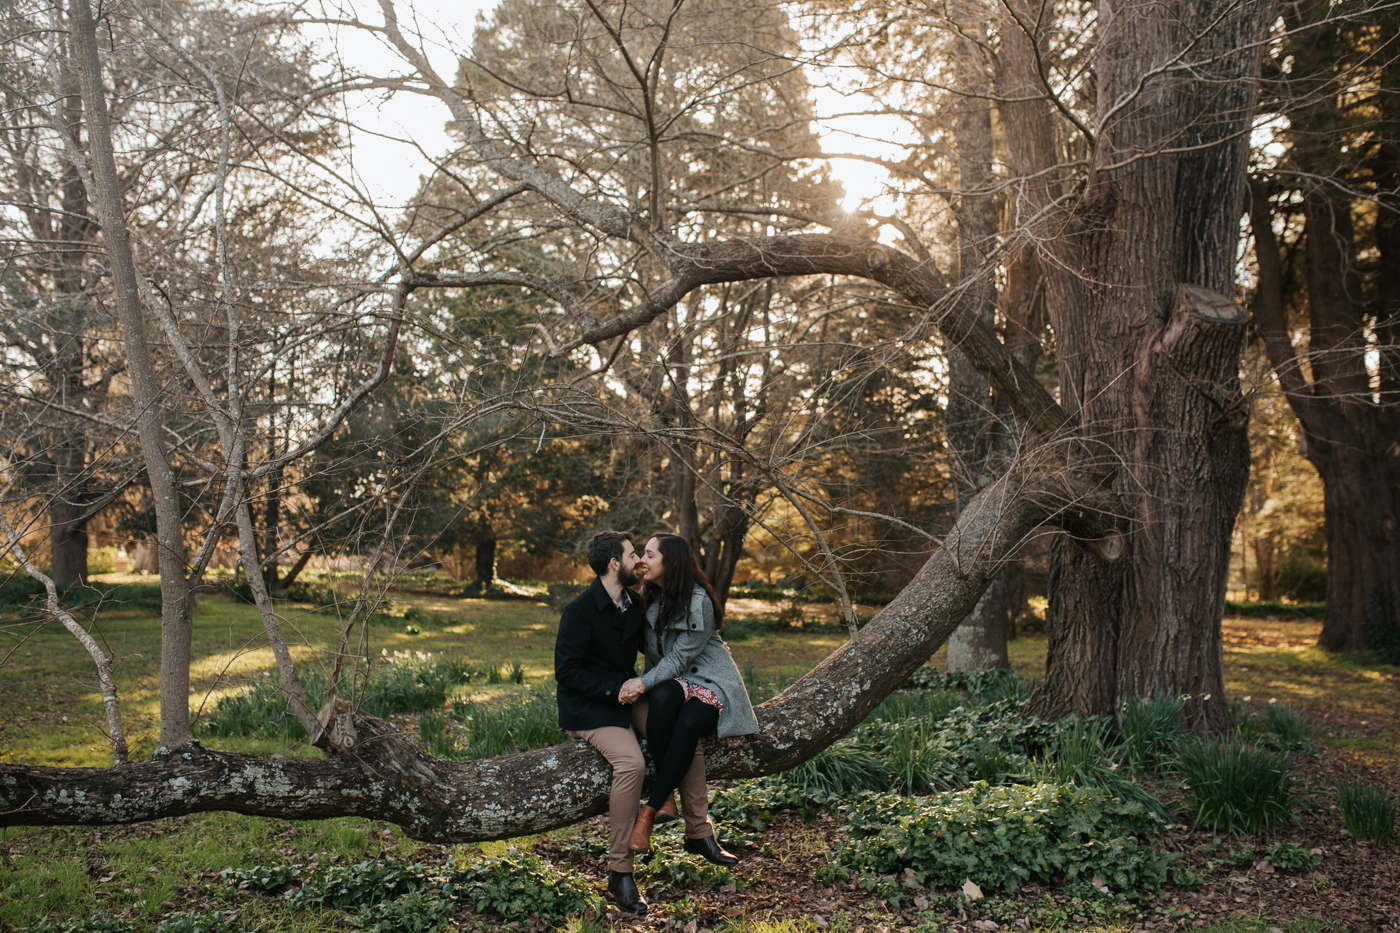 Kate & Kieran - Southern Highlands Engagement - Samantha Heather Photography-20.jpg